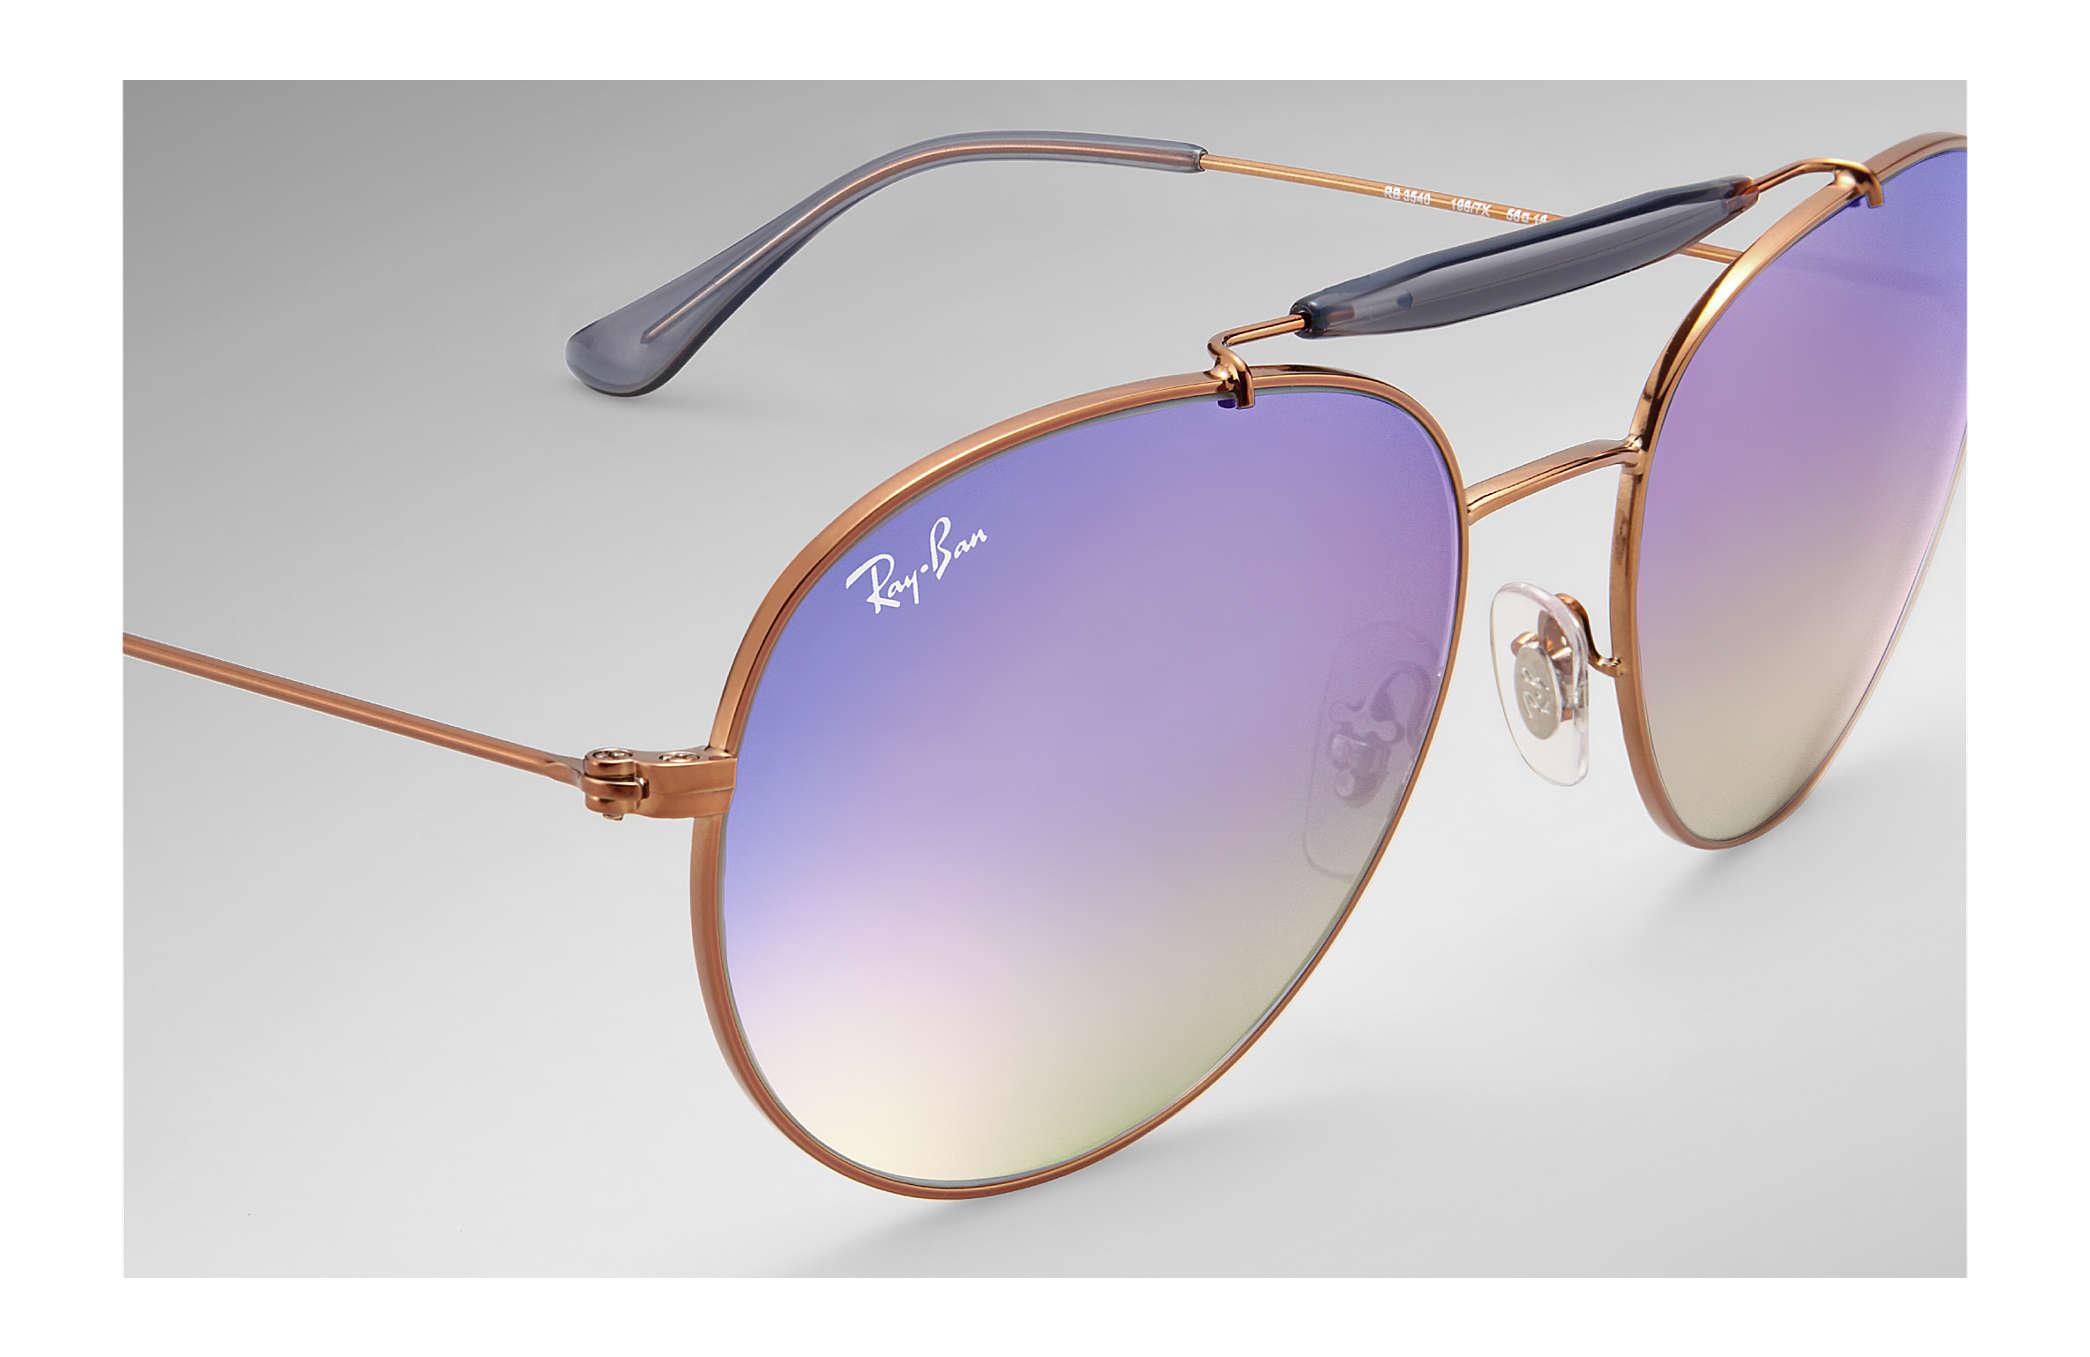 c222e94e71 Ray-Ban RB3540 Bronze-Copper - Metal - Lilac Lenses - 0RB3540198 ...